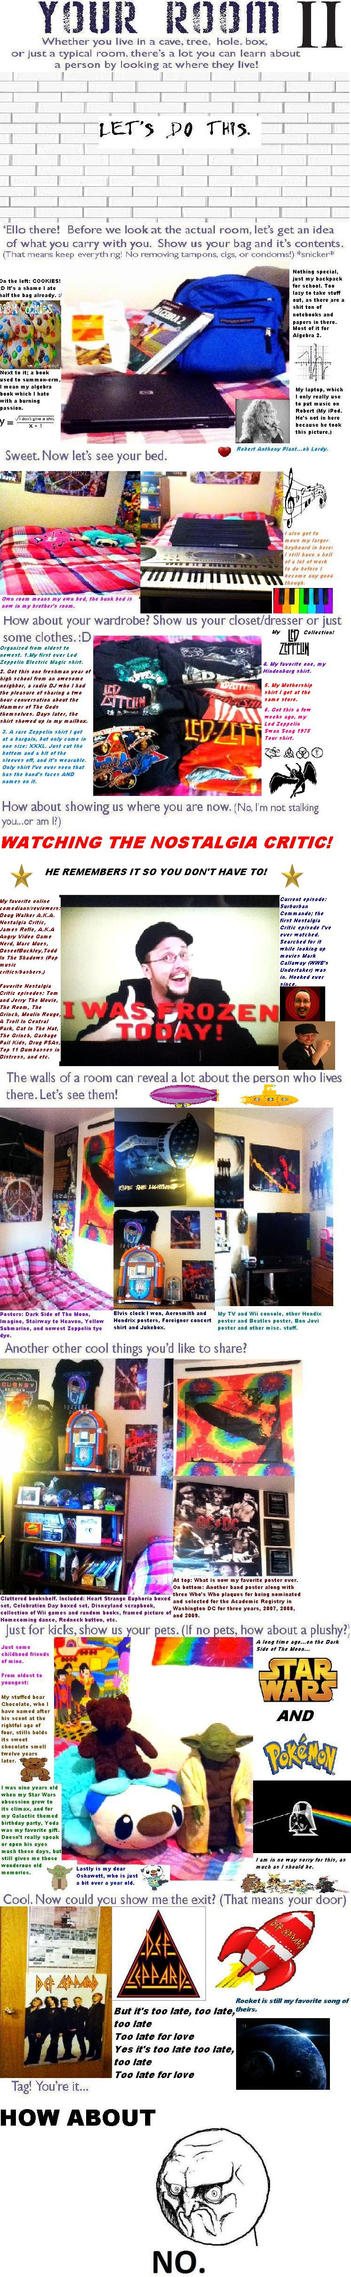 My Room Meme II by CassieCros13